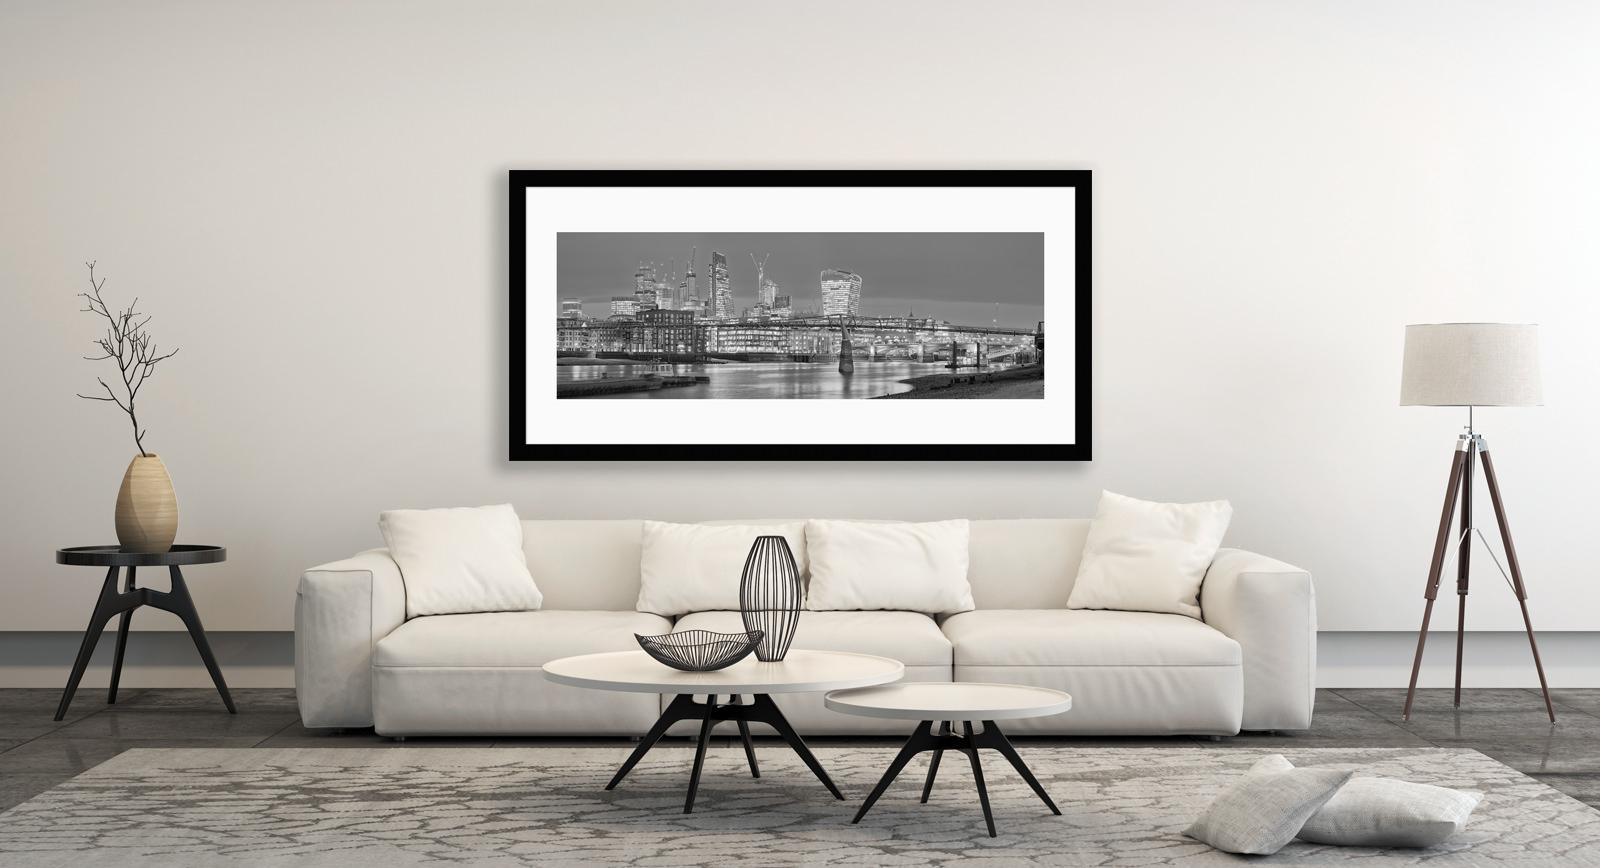 Low Tide at Millennium Bridge - Will Pearson Framed Fine Art Photographic Print in Situ